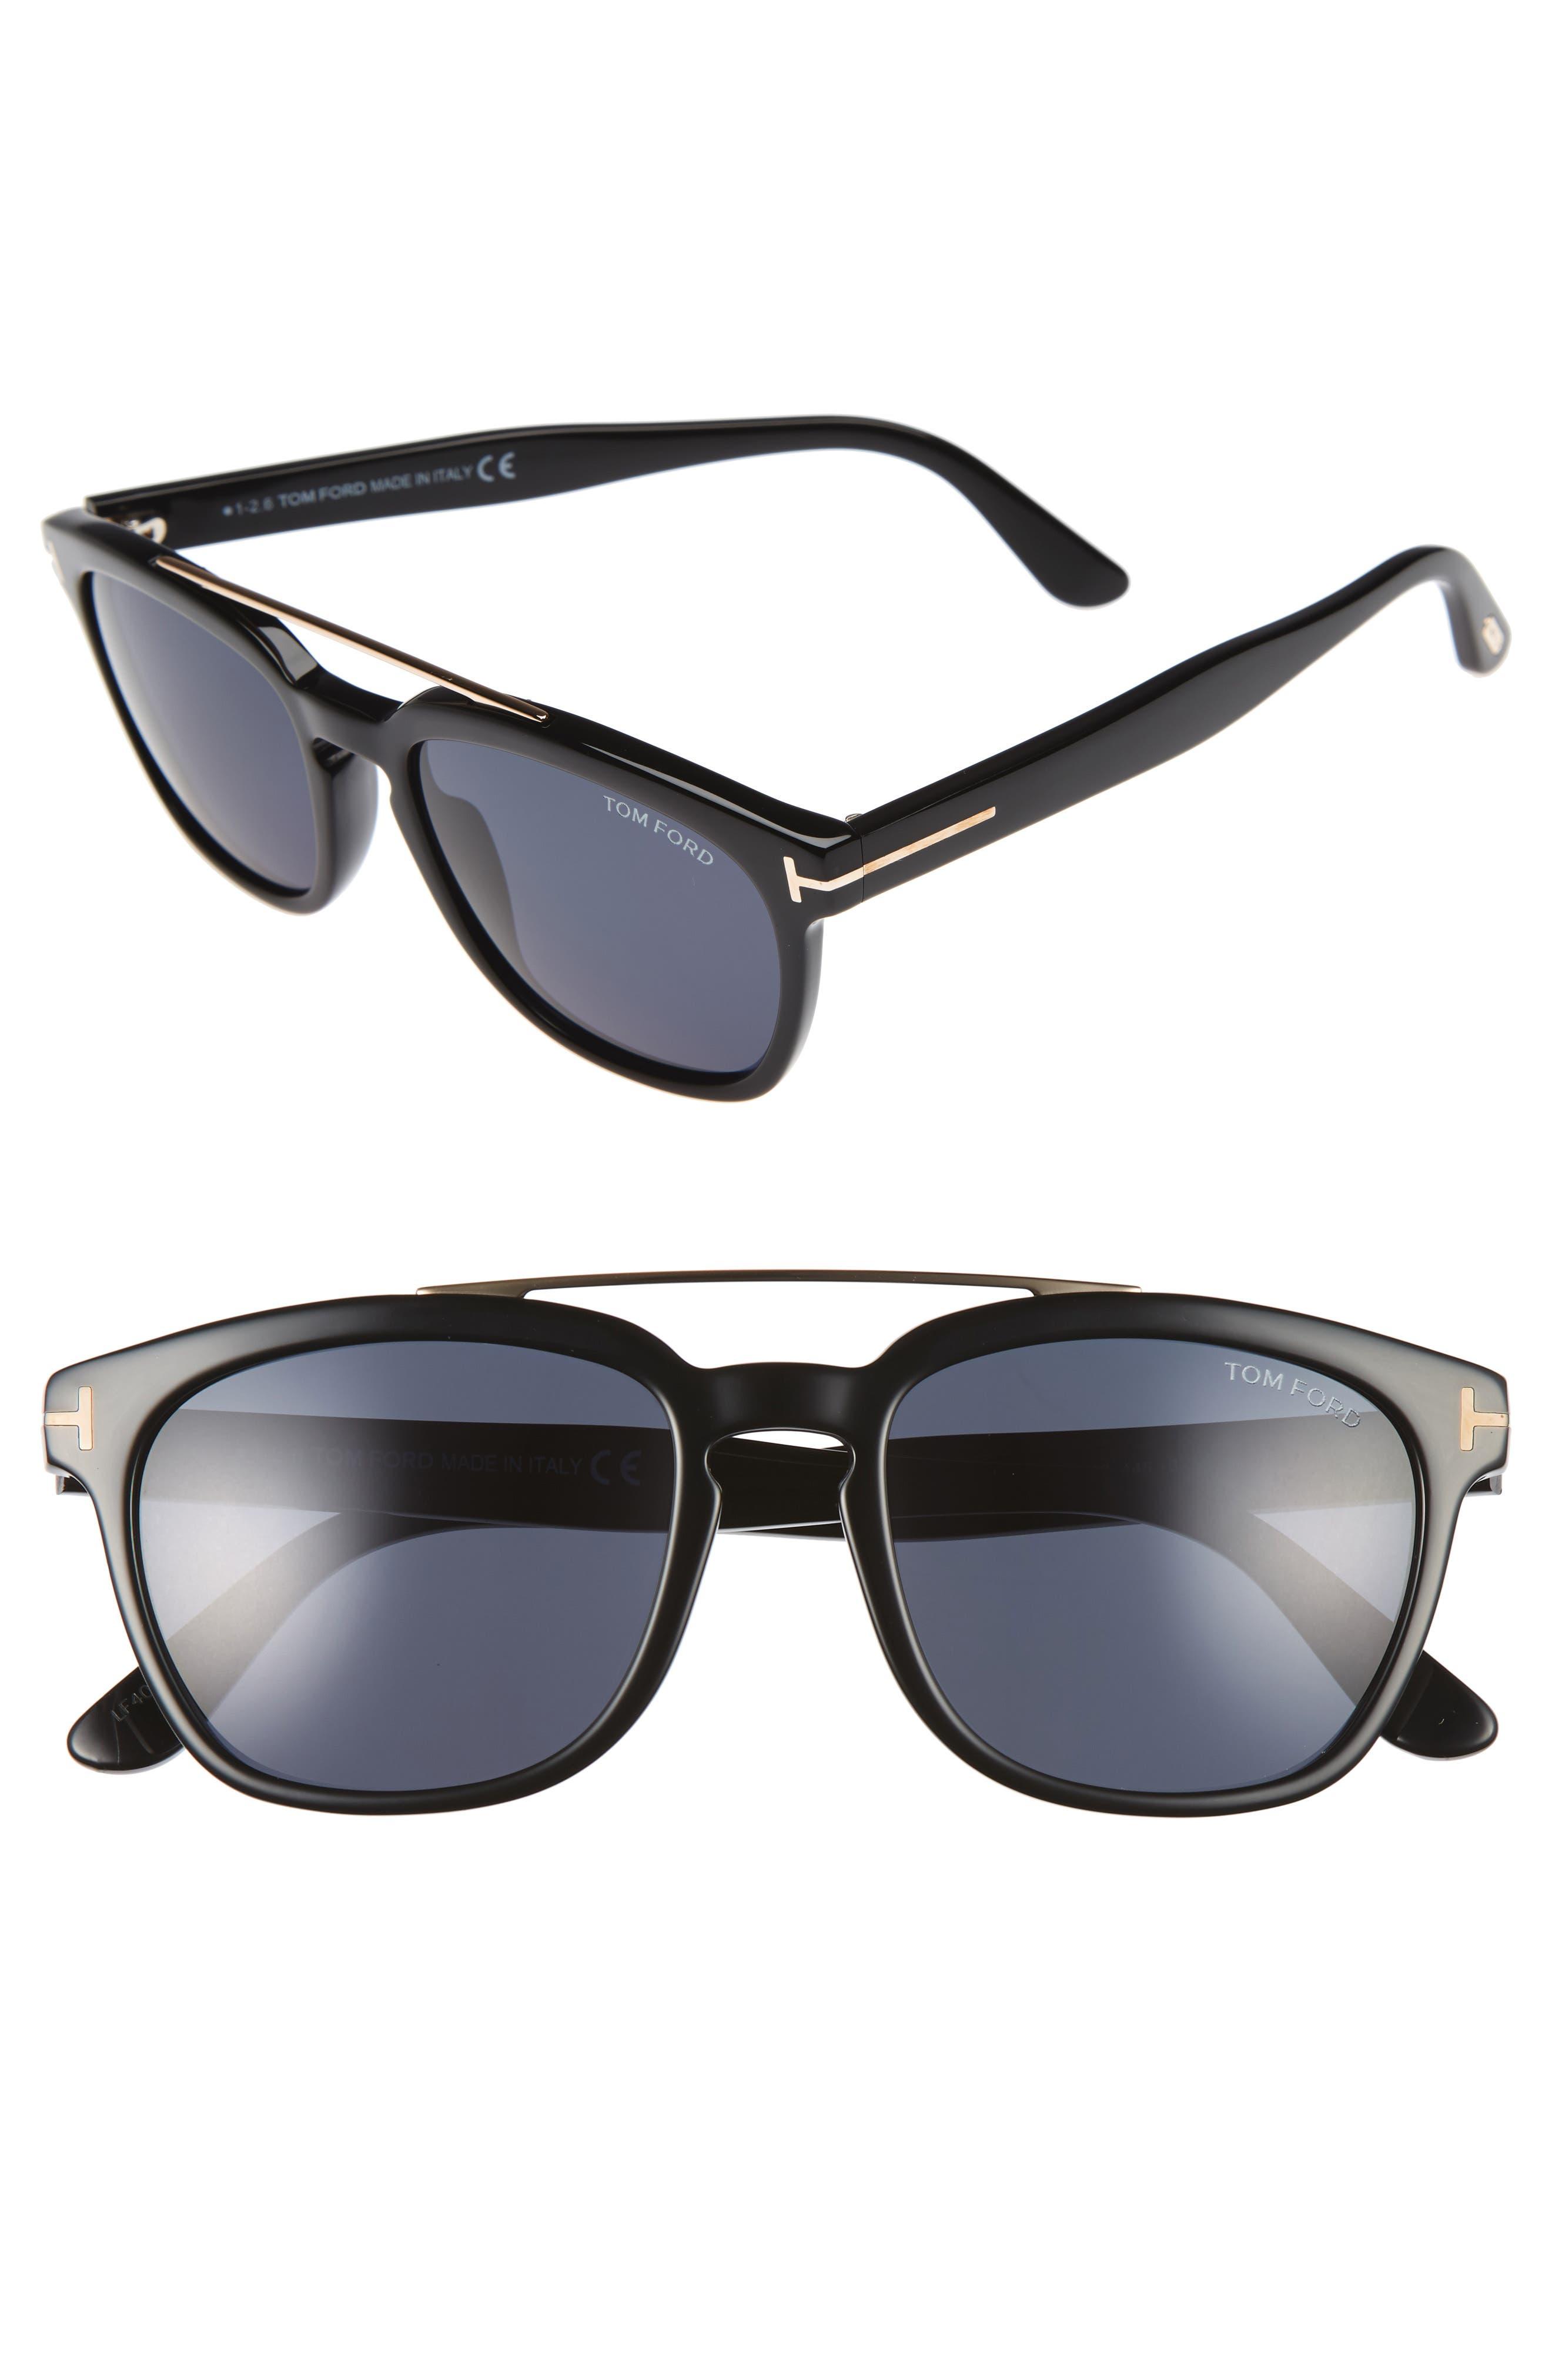 TOM FORD Holt 54mm Sunglasses, Main, color, 018